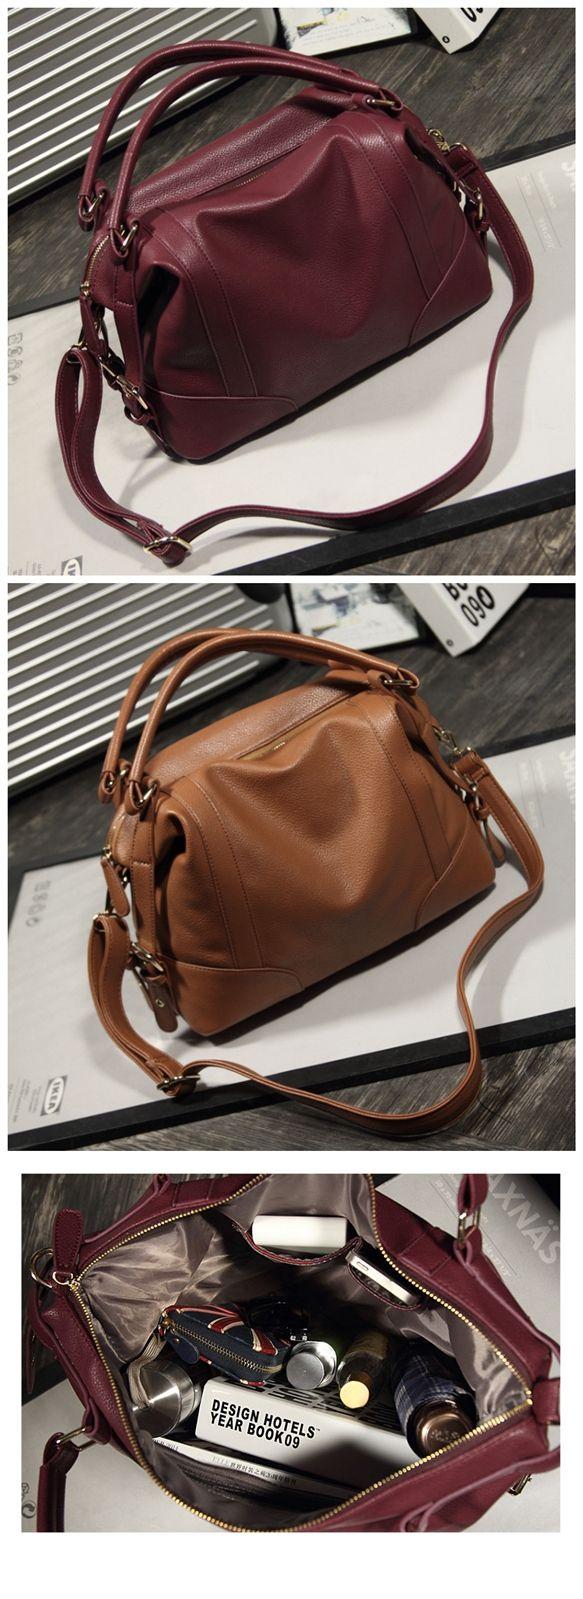 Women's Handbag Female PU Leather Bags Handbags Ladies Portable Shoulder Bag Office Ladies Hobos Bag Totes Bagail.com